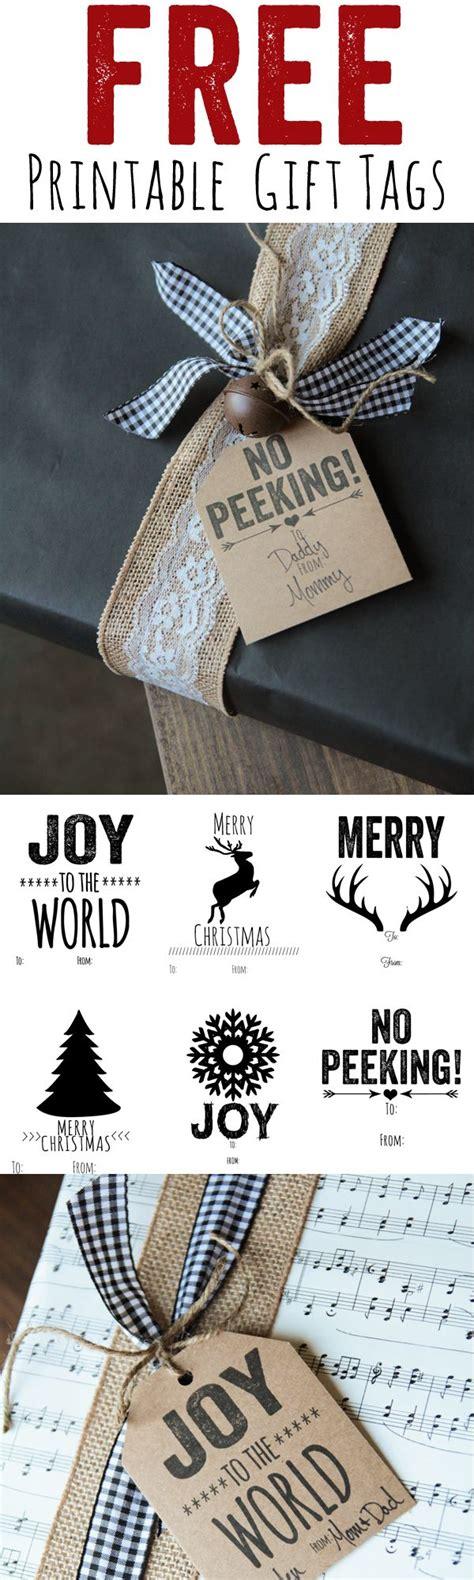 christmas gift tags printable decor the best free christmas printables gift tags holiday